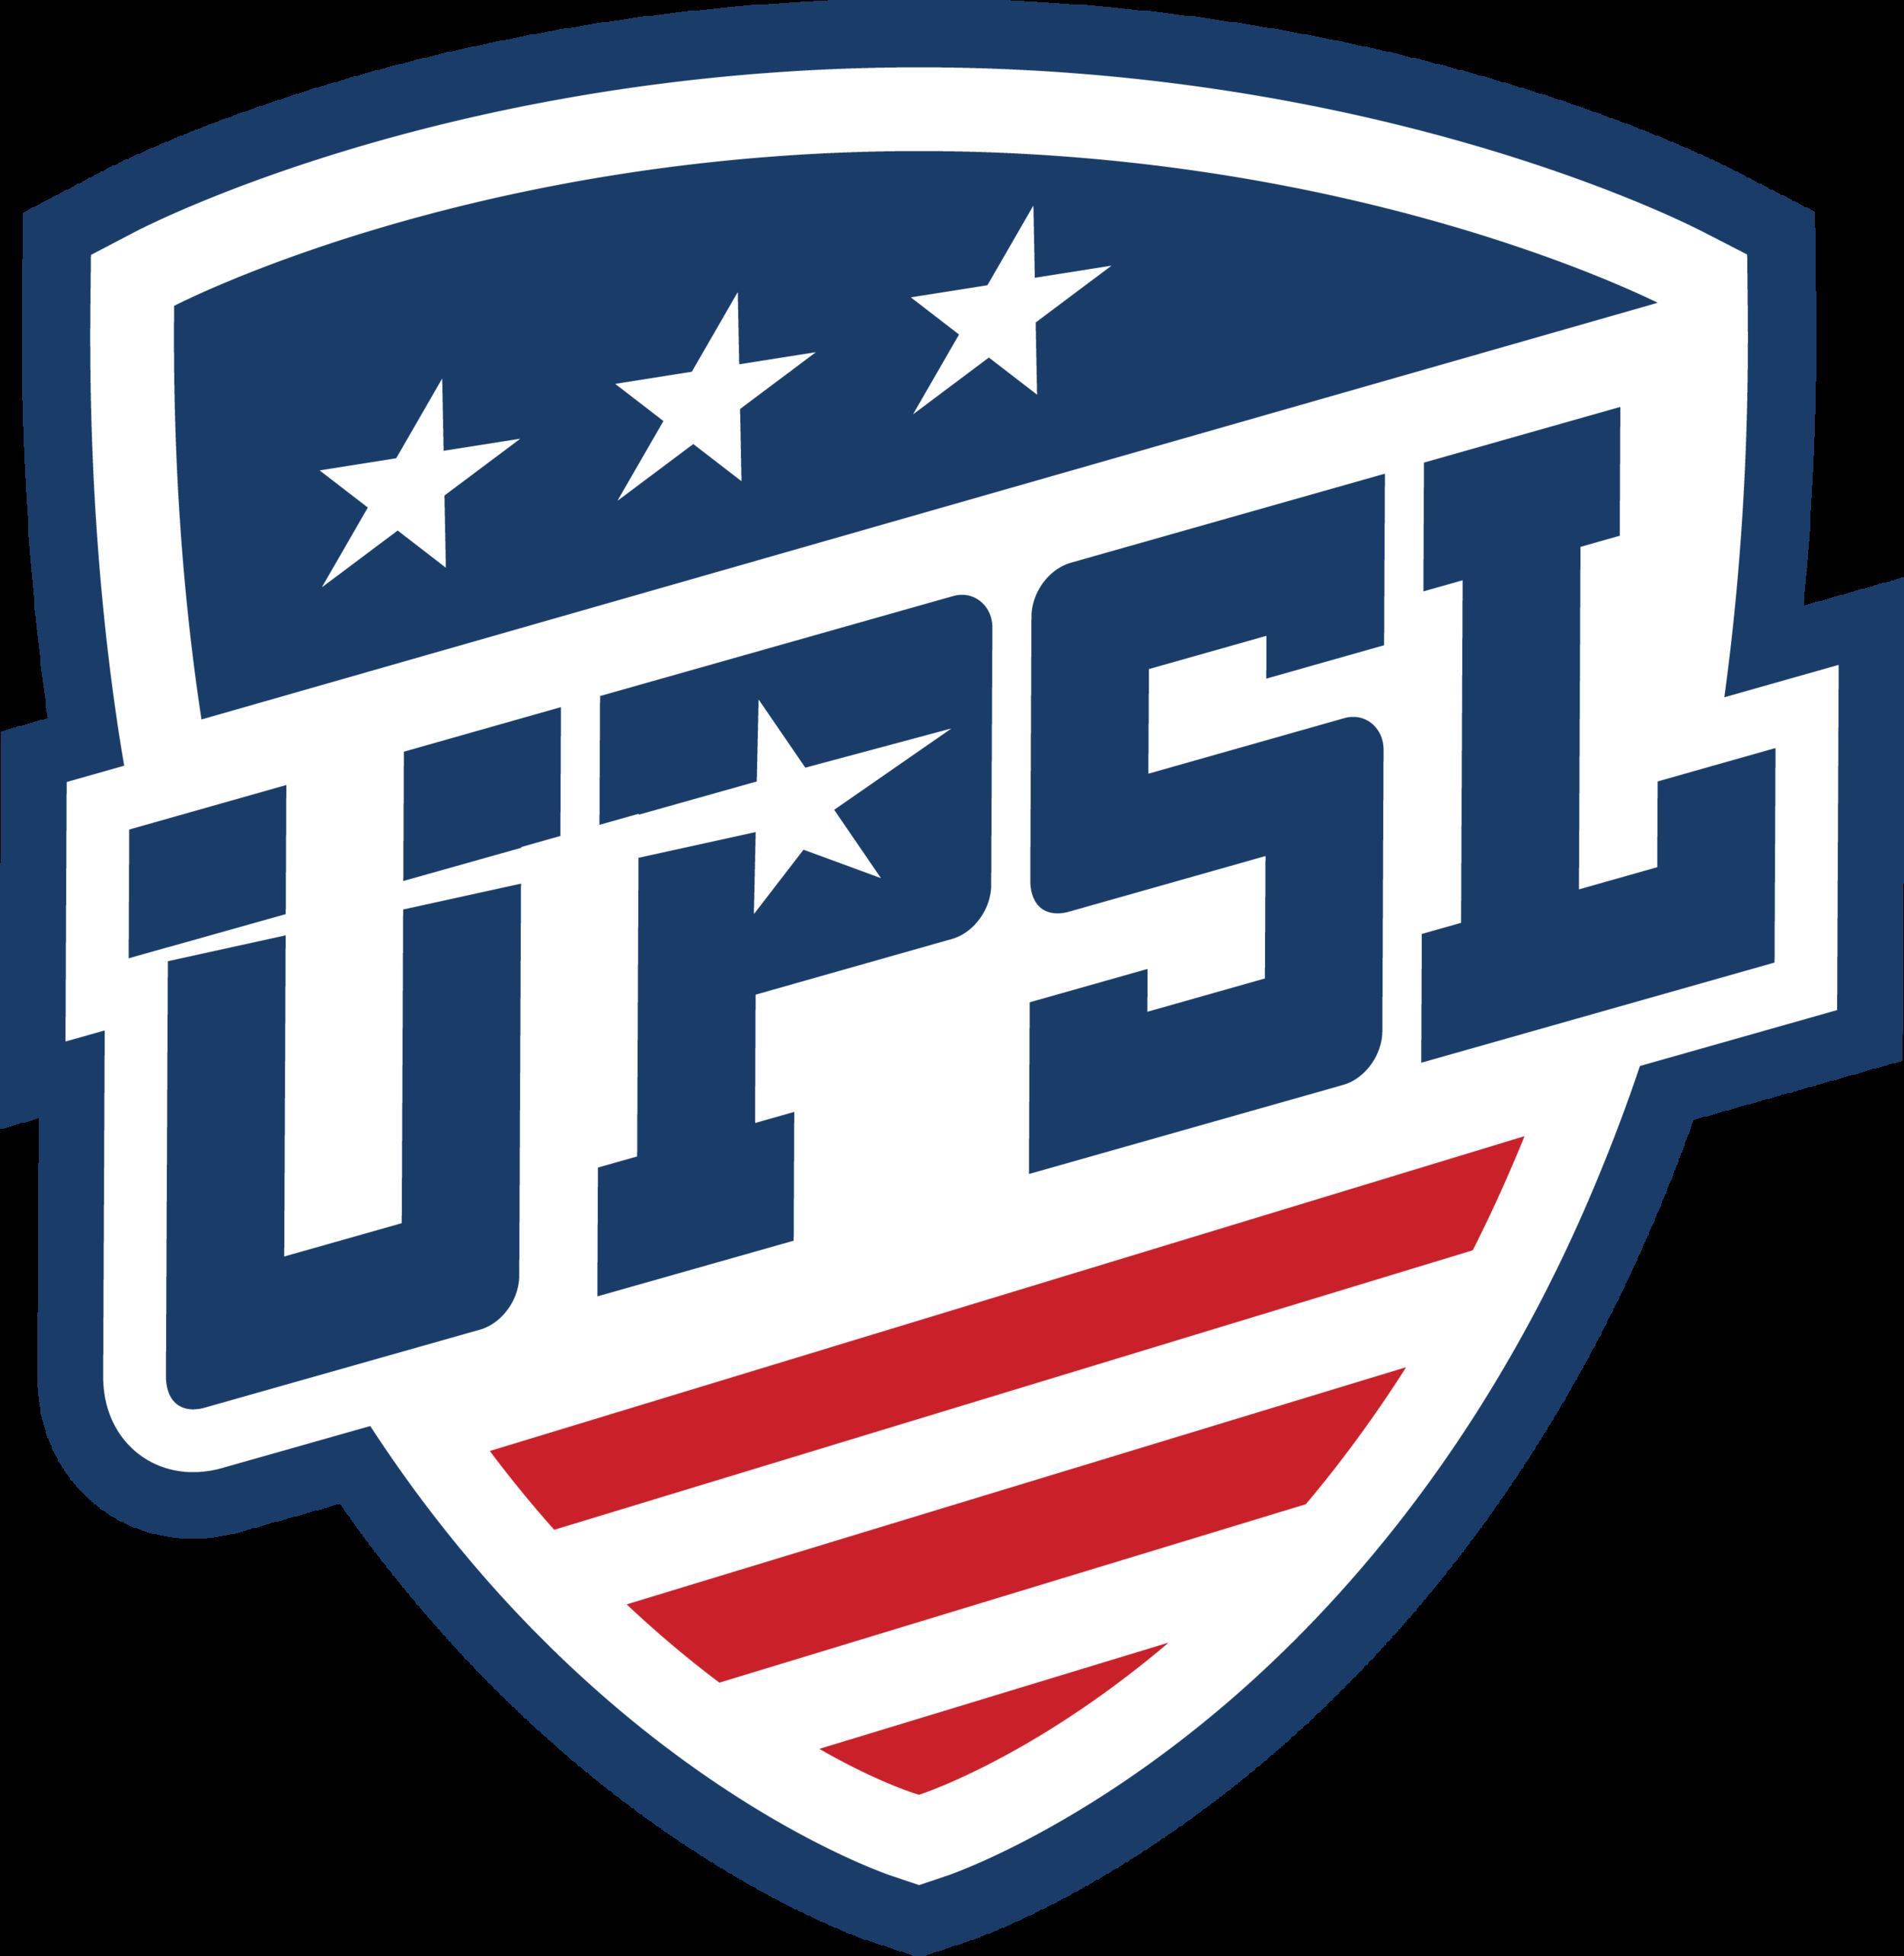 UPSL_new_logo (2).png